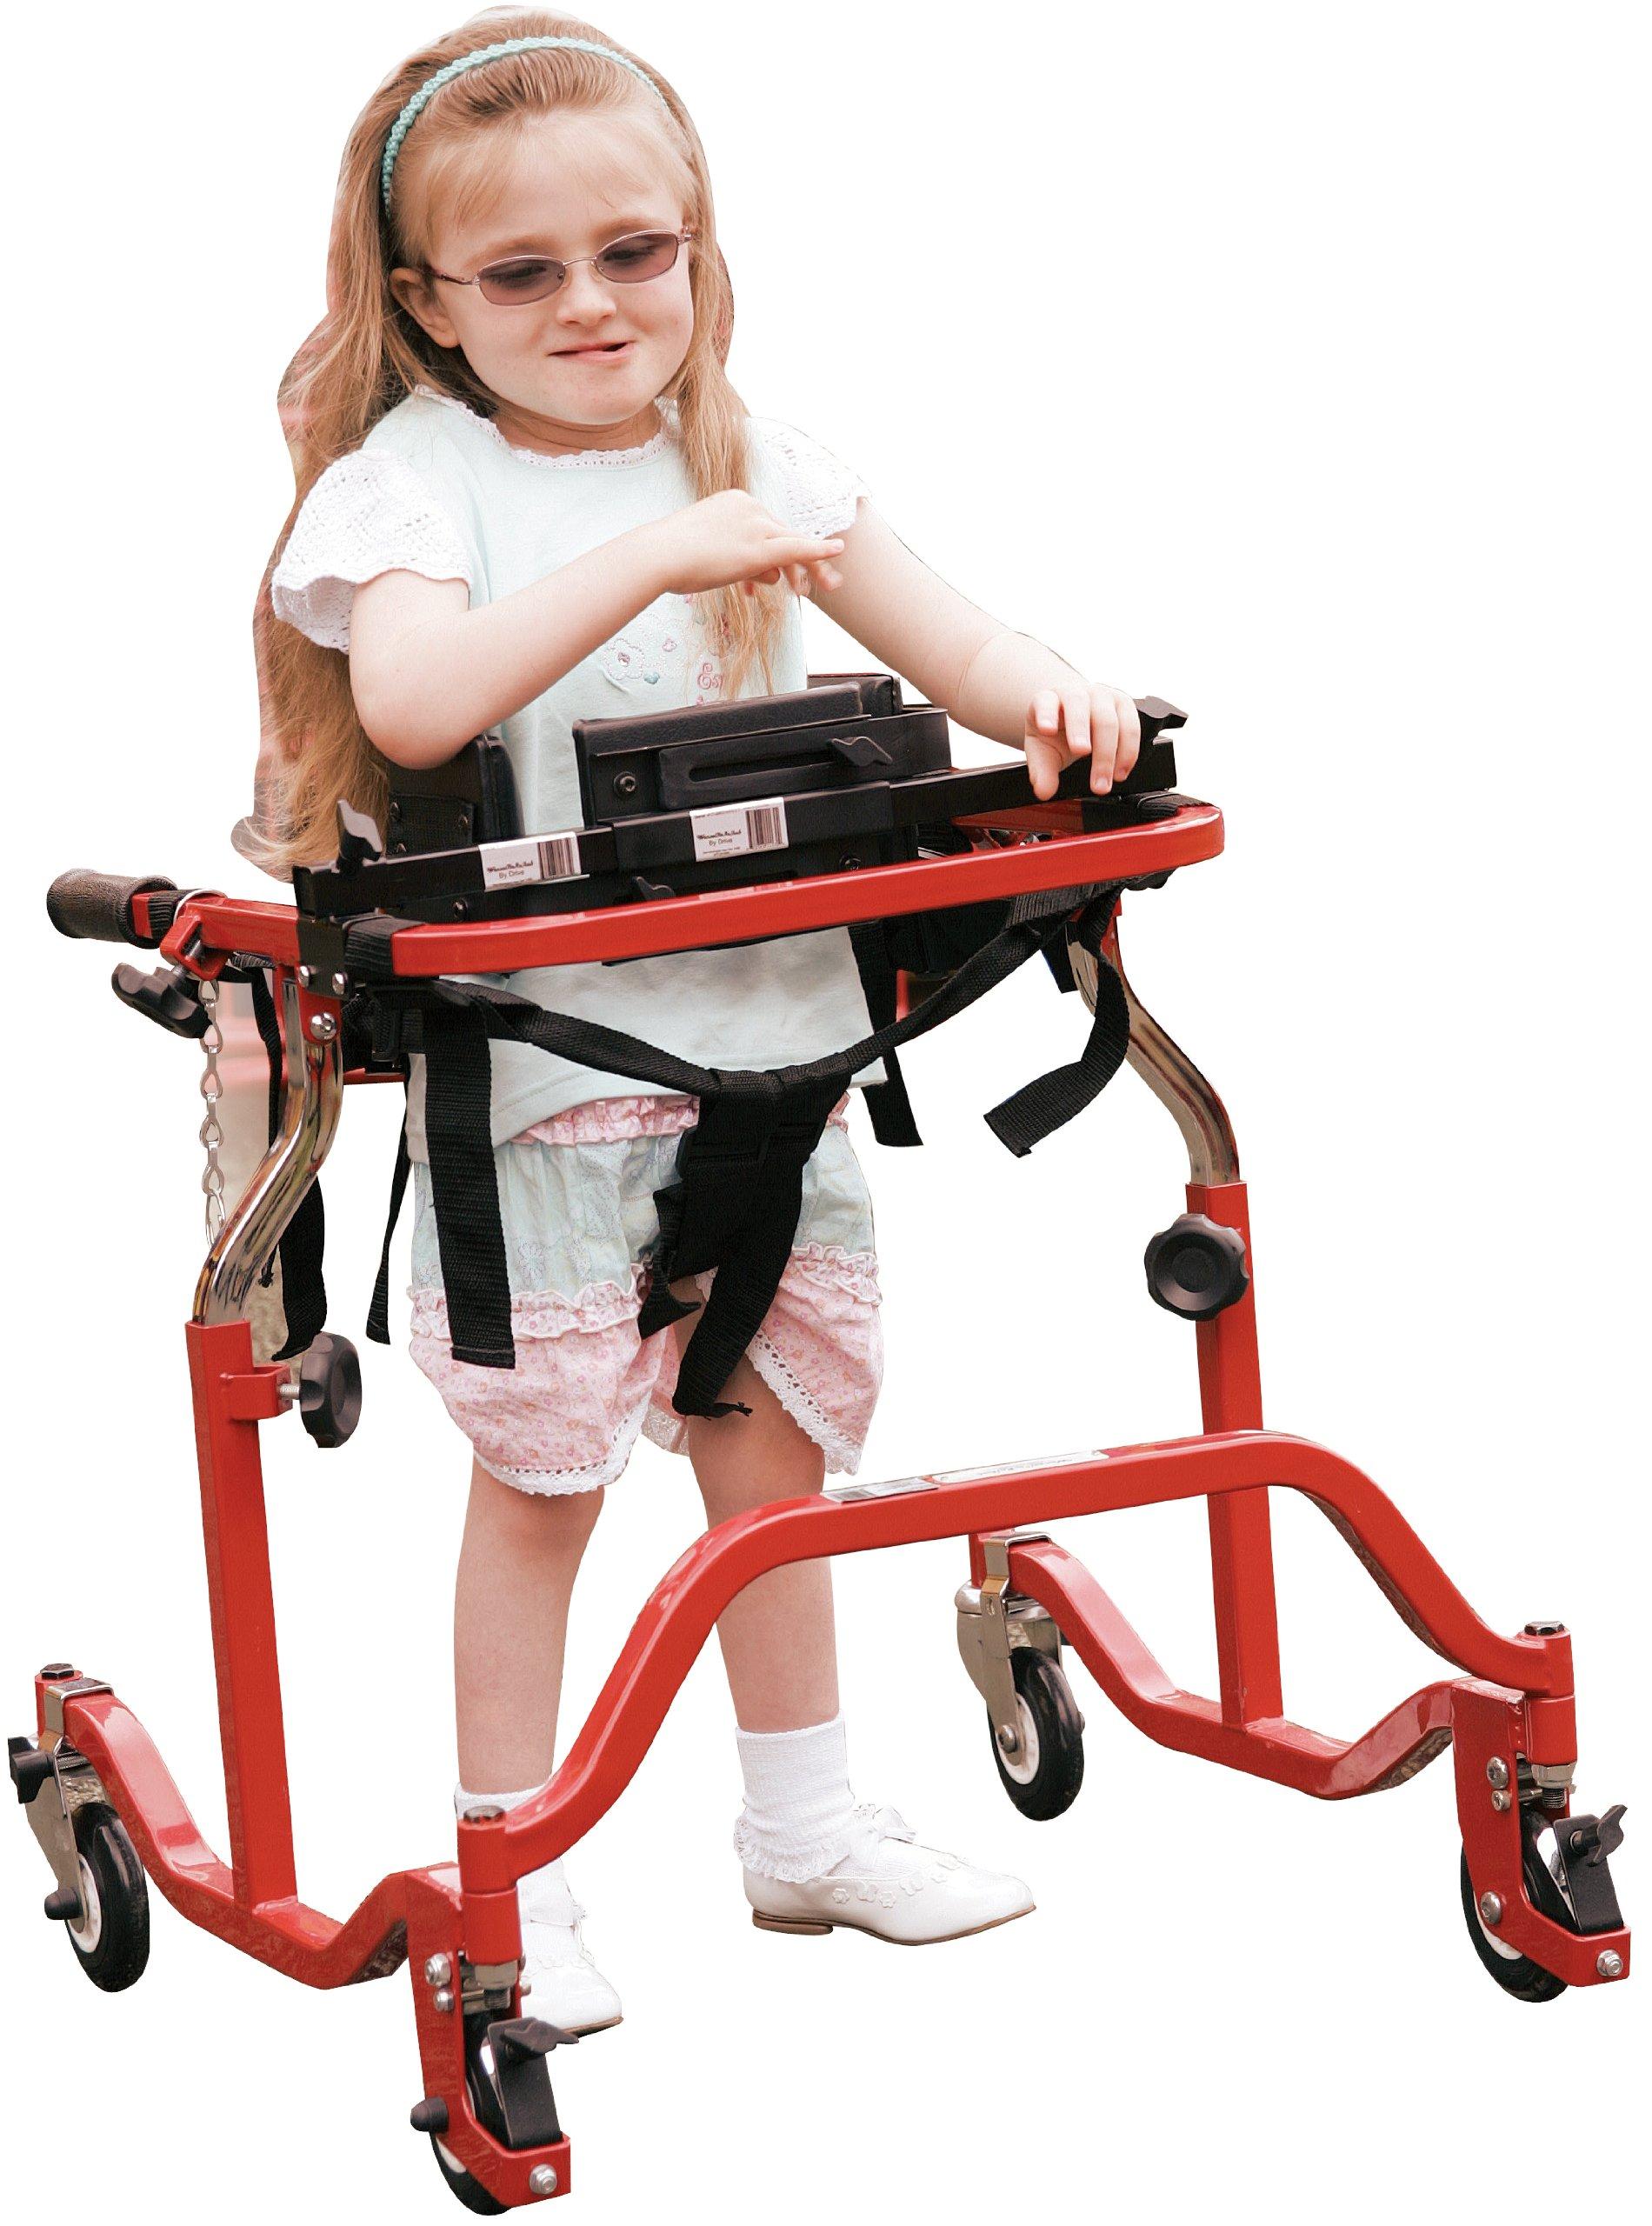 Wenzelite Luminator Gait Trainer with Posterior or Anterior Option, Red, Pediatric